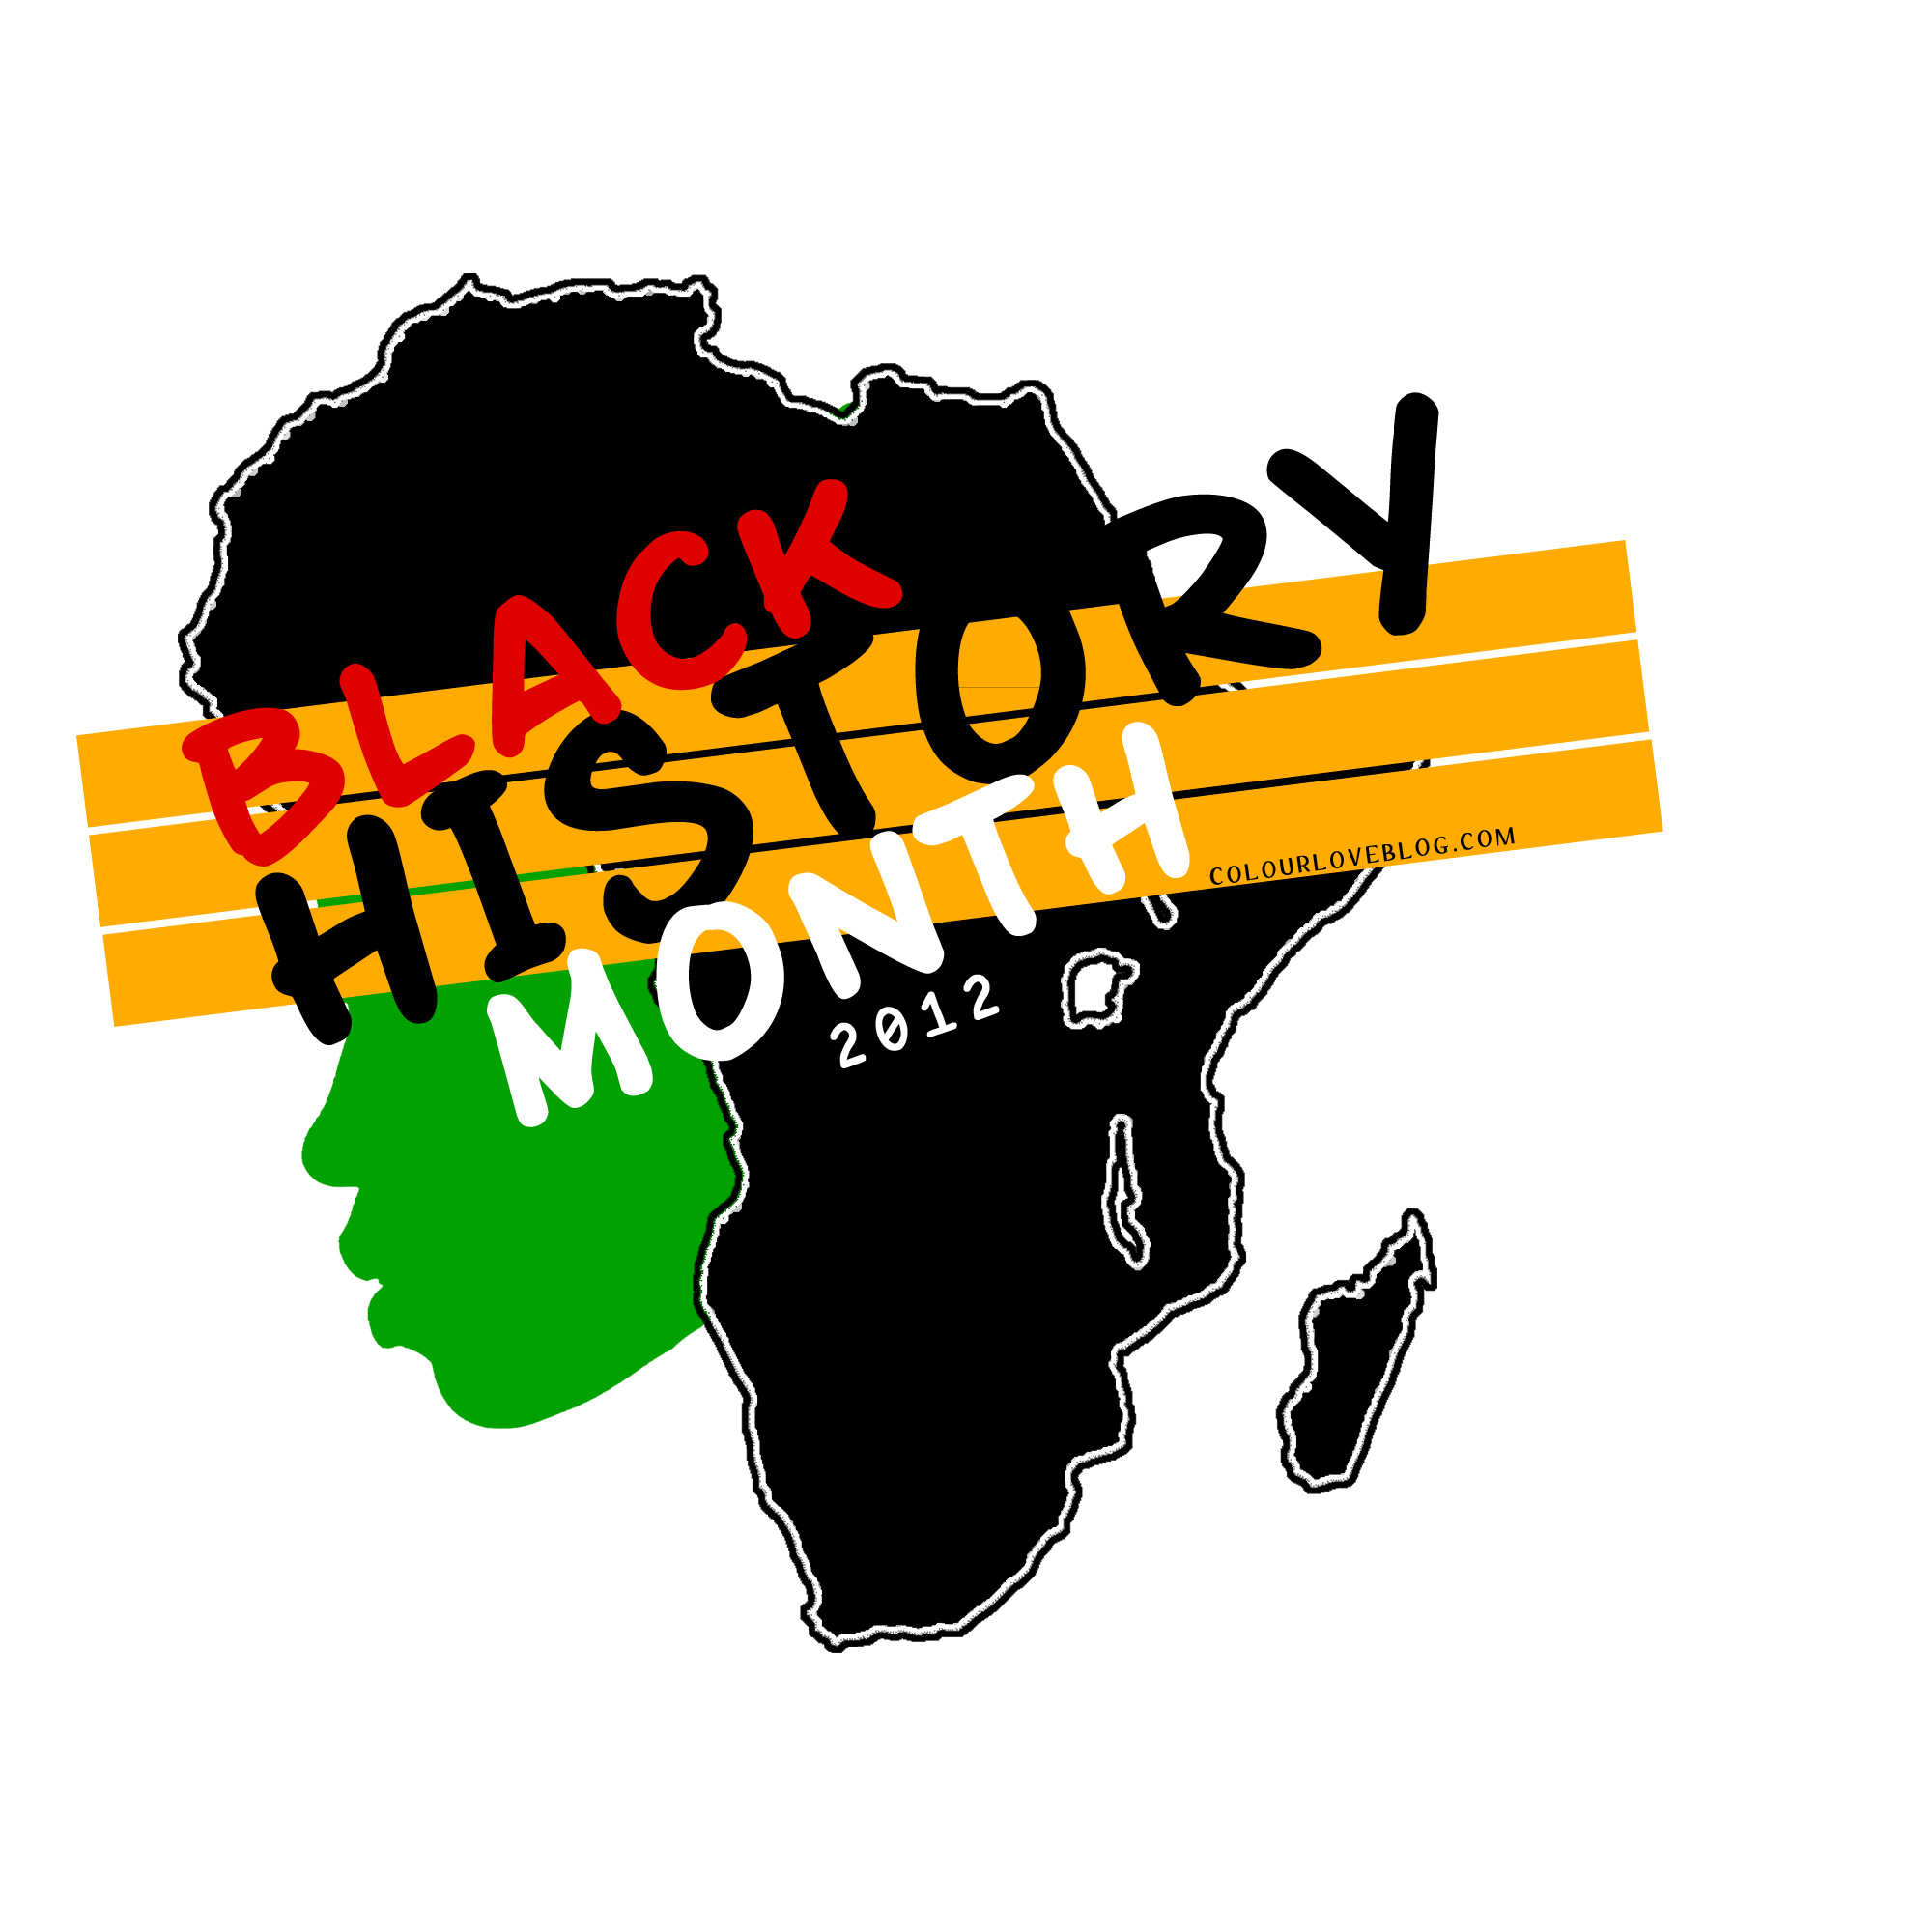 Black History Month Clip Art Tumundografico.